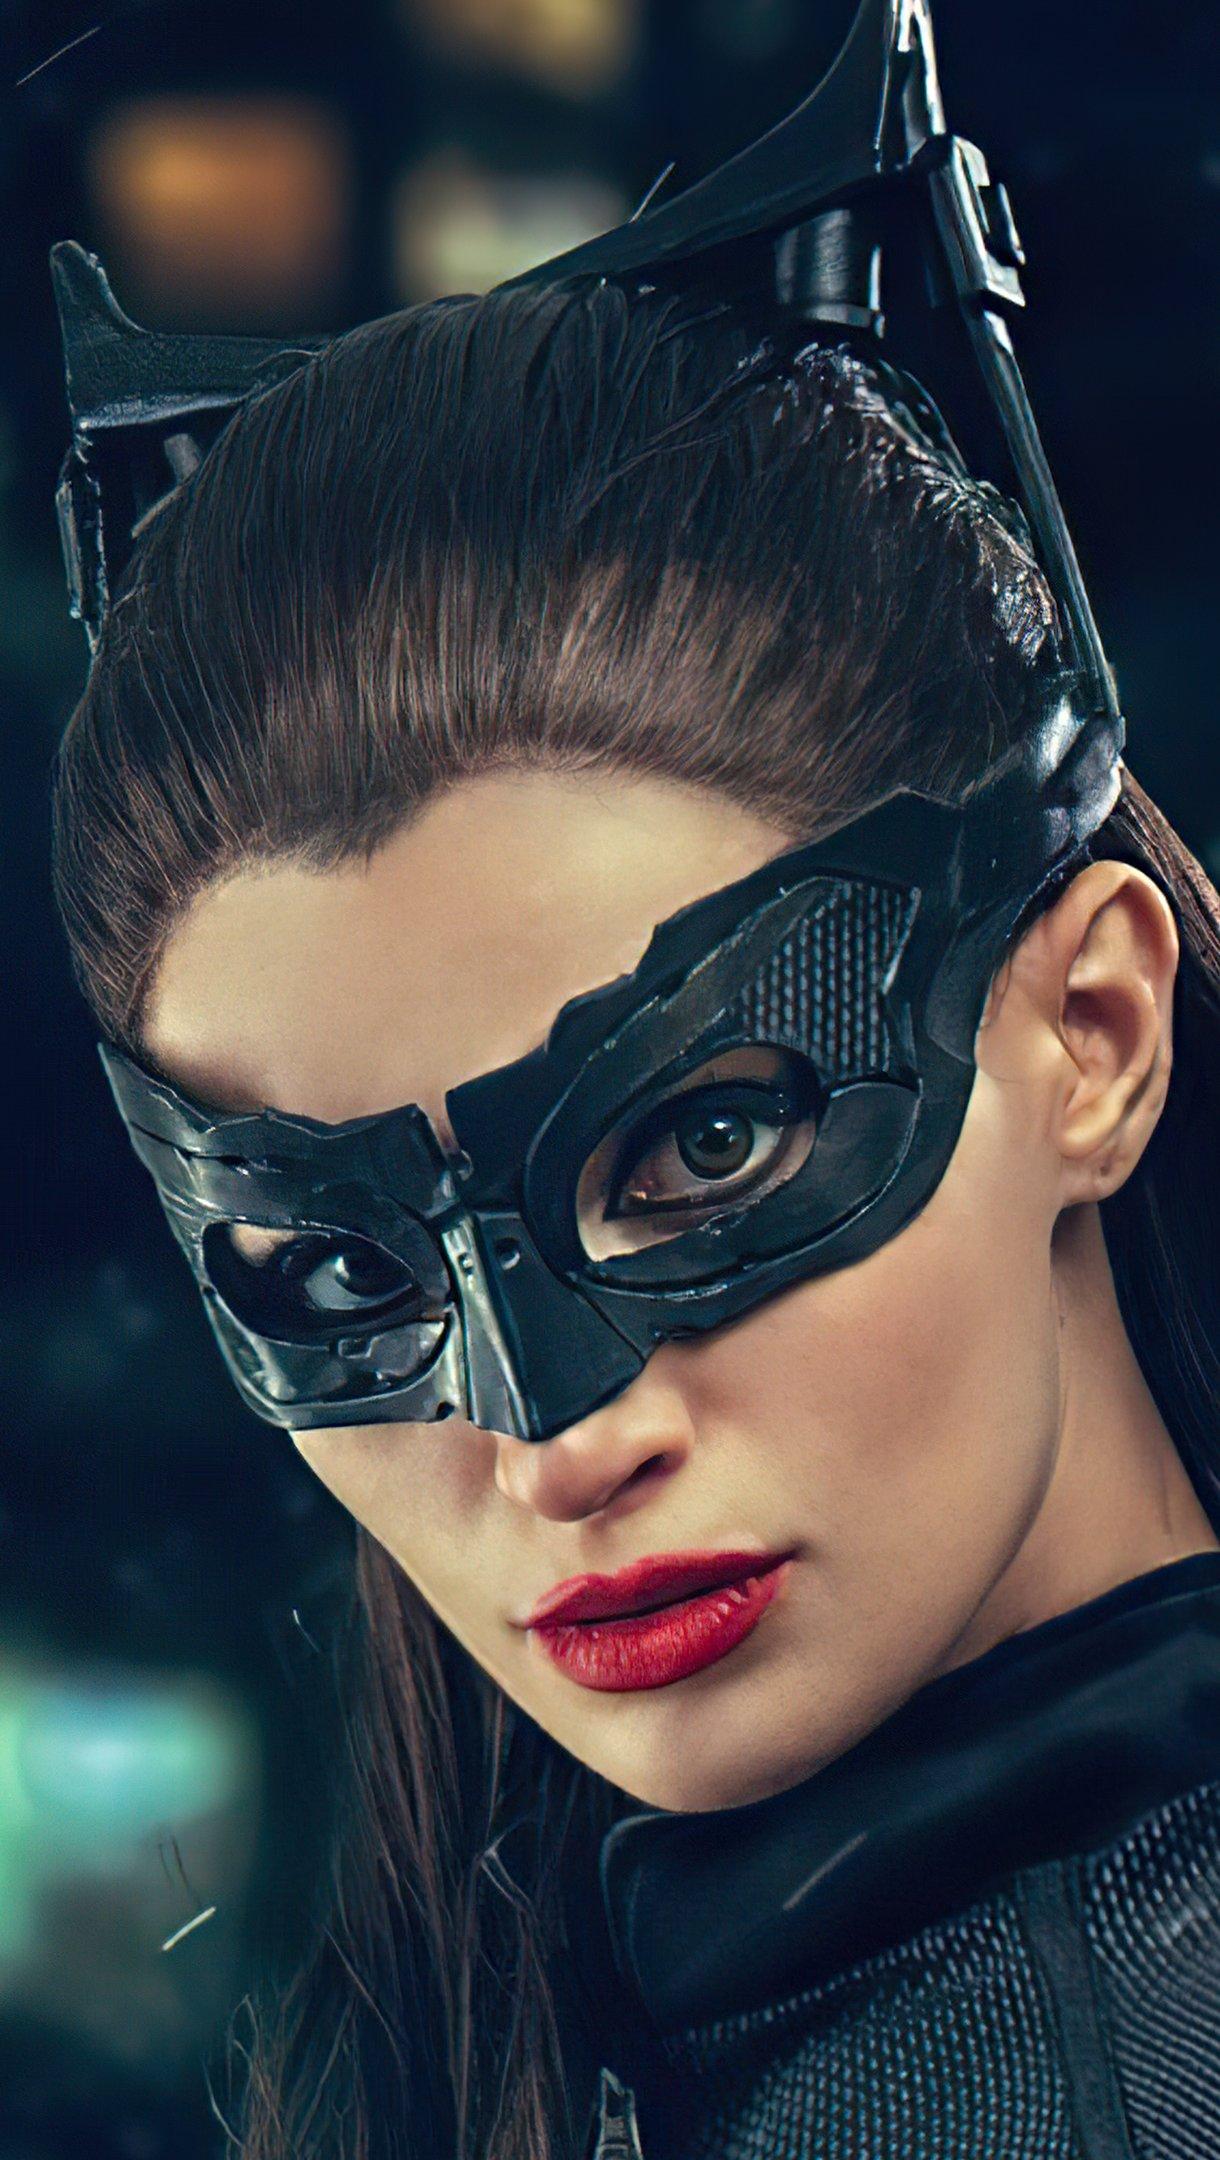 Wallpaper Catwoman Cosplay Vertical